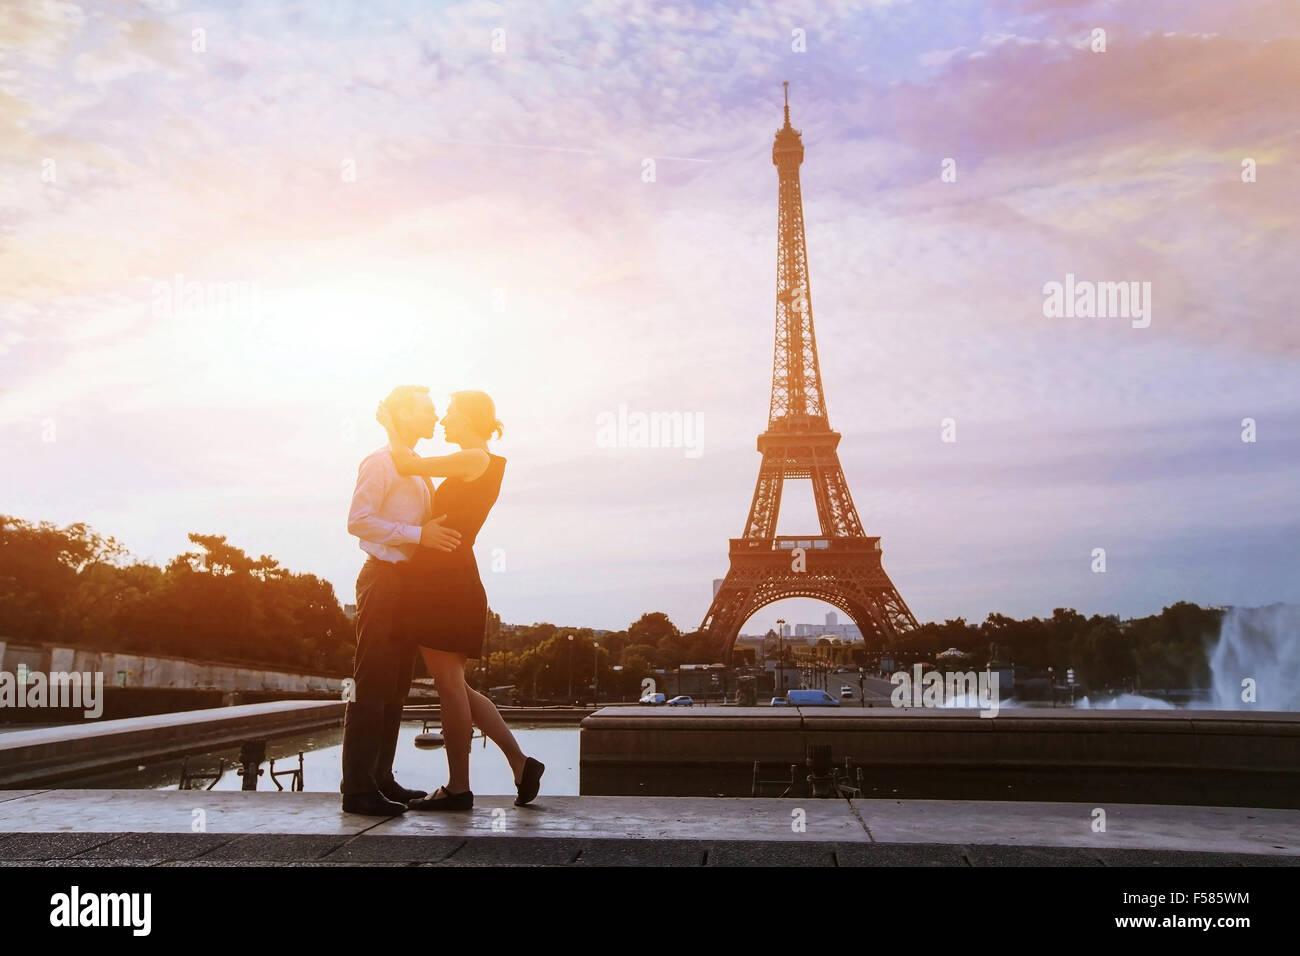 Siluetas de pareja amorosa en París Imagen De Stock